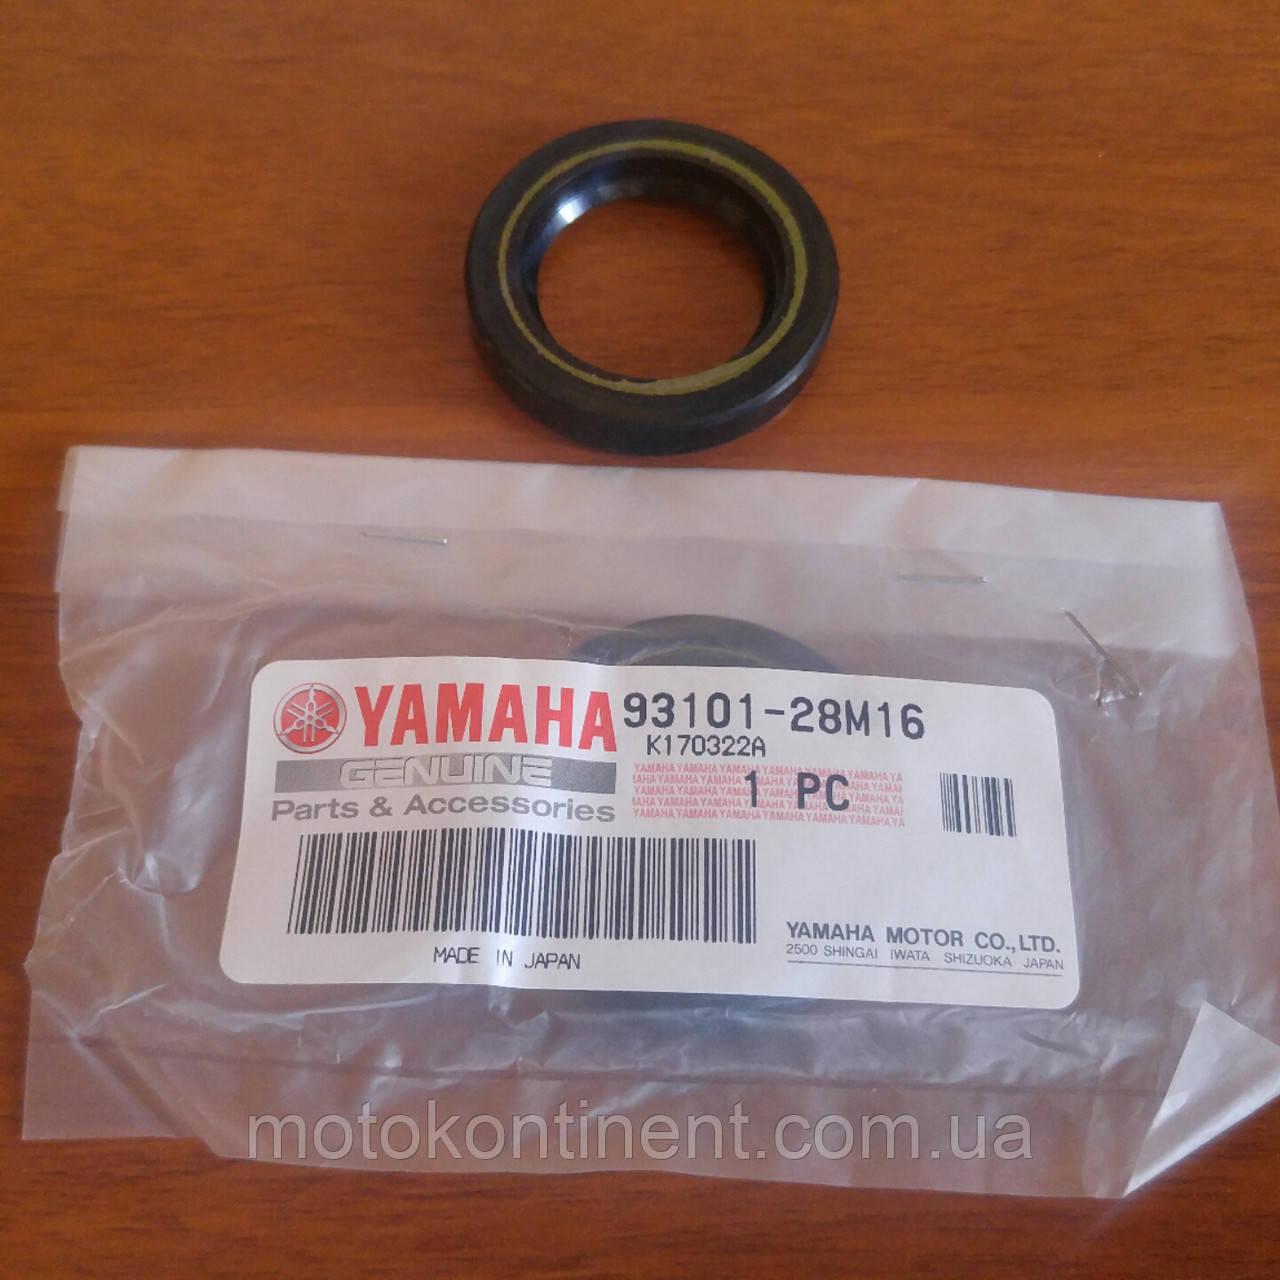 93101-28M16 Сальник вертикального вала 28x43x7 Yamaha F150-F300